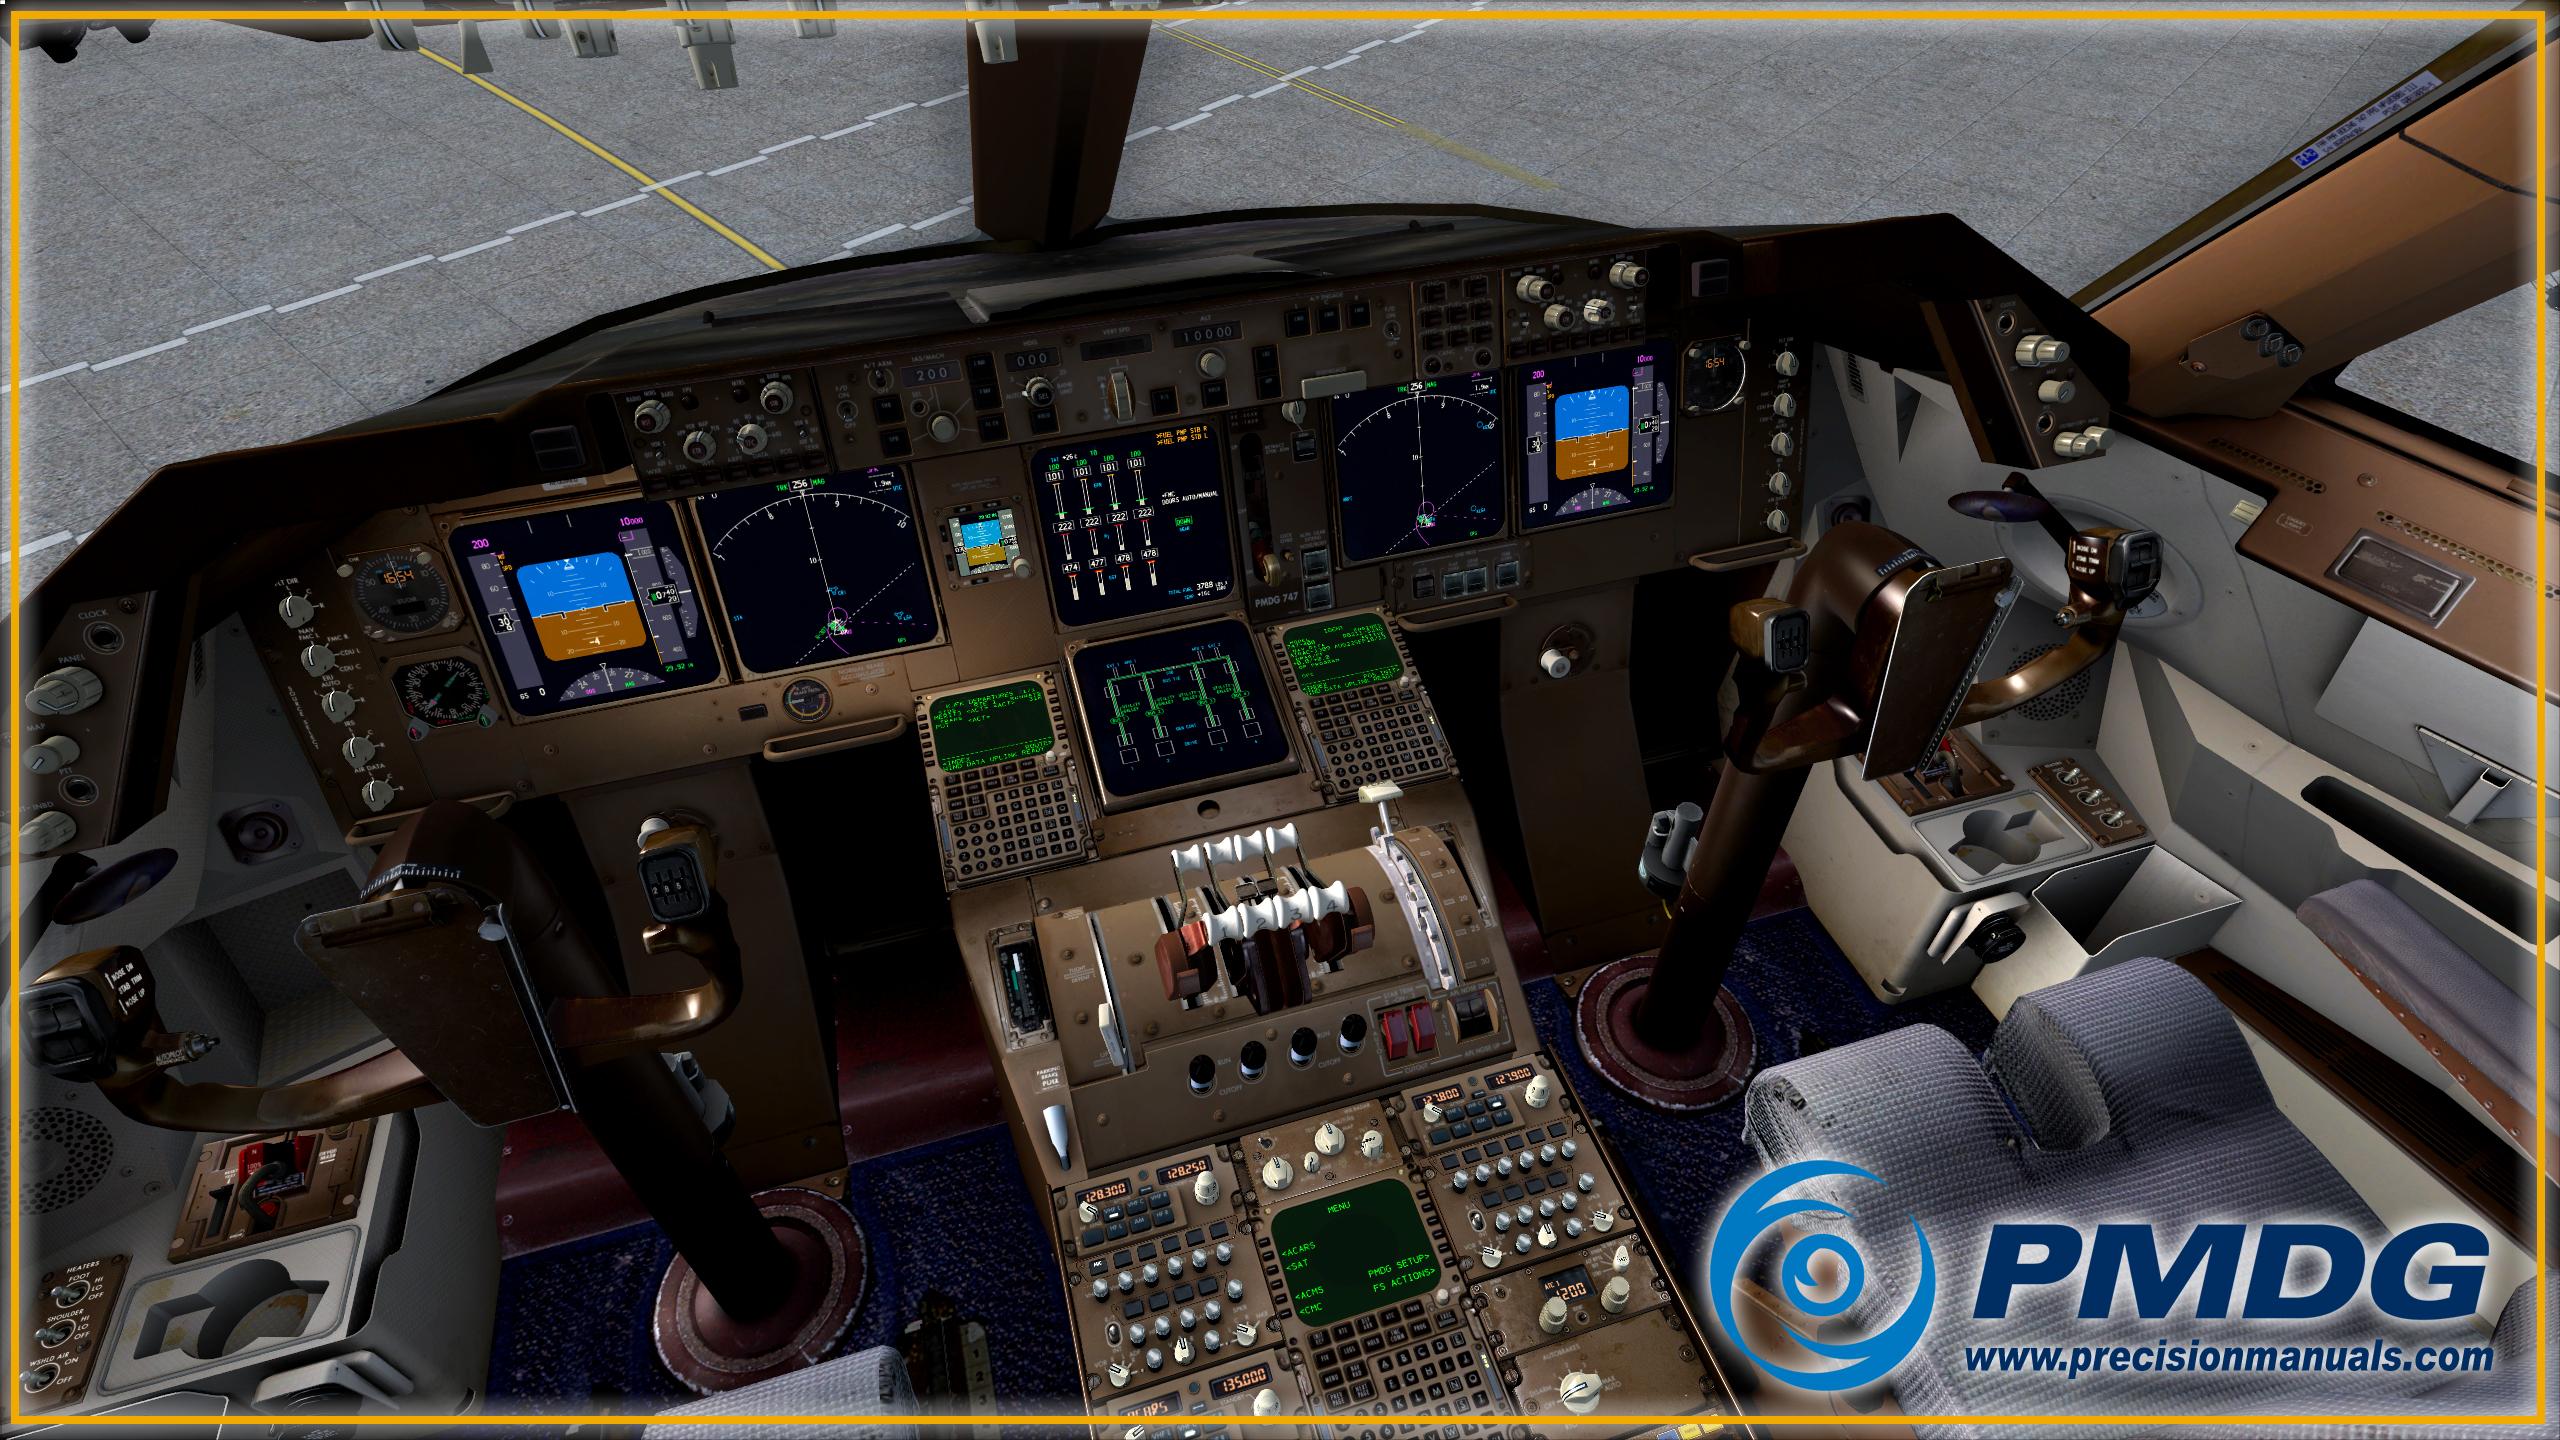 PMDG_747-400_Top_Down_VC_View.jpg